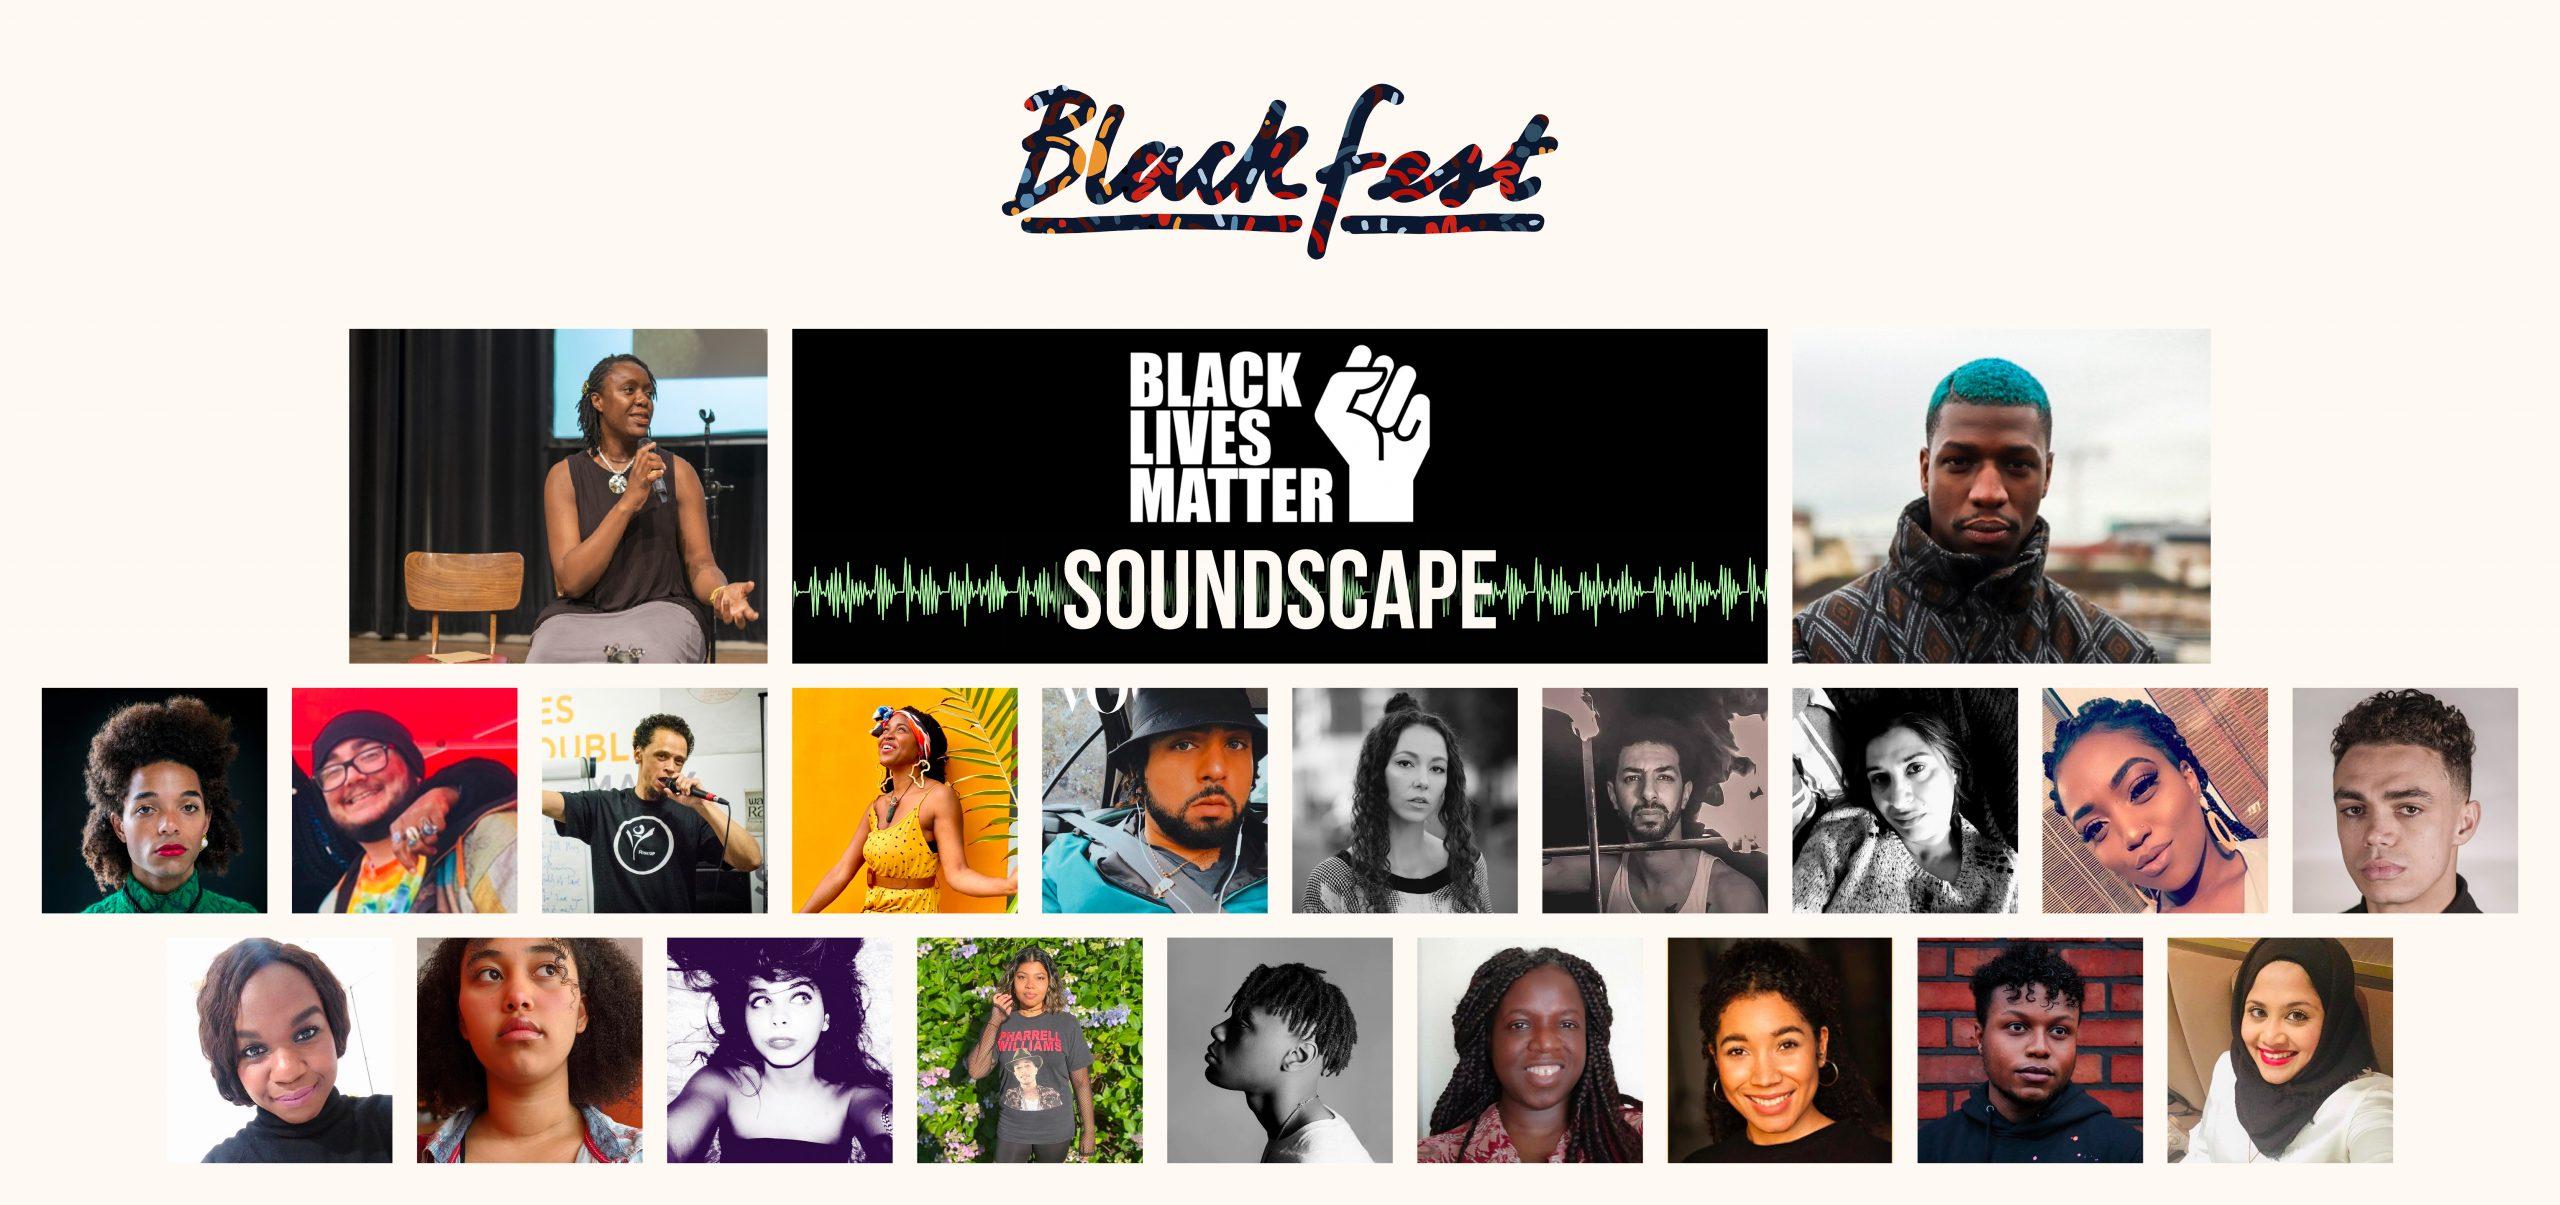 https://www.blackfest.co.uk/wp-content/uploads/2020/08/BLM-Soundscape-2-copy-scaled.jpg